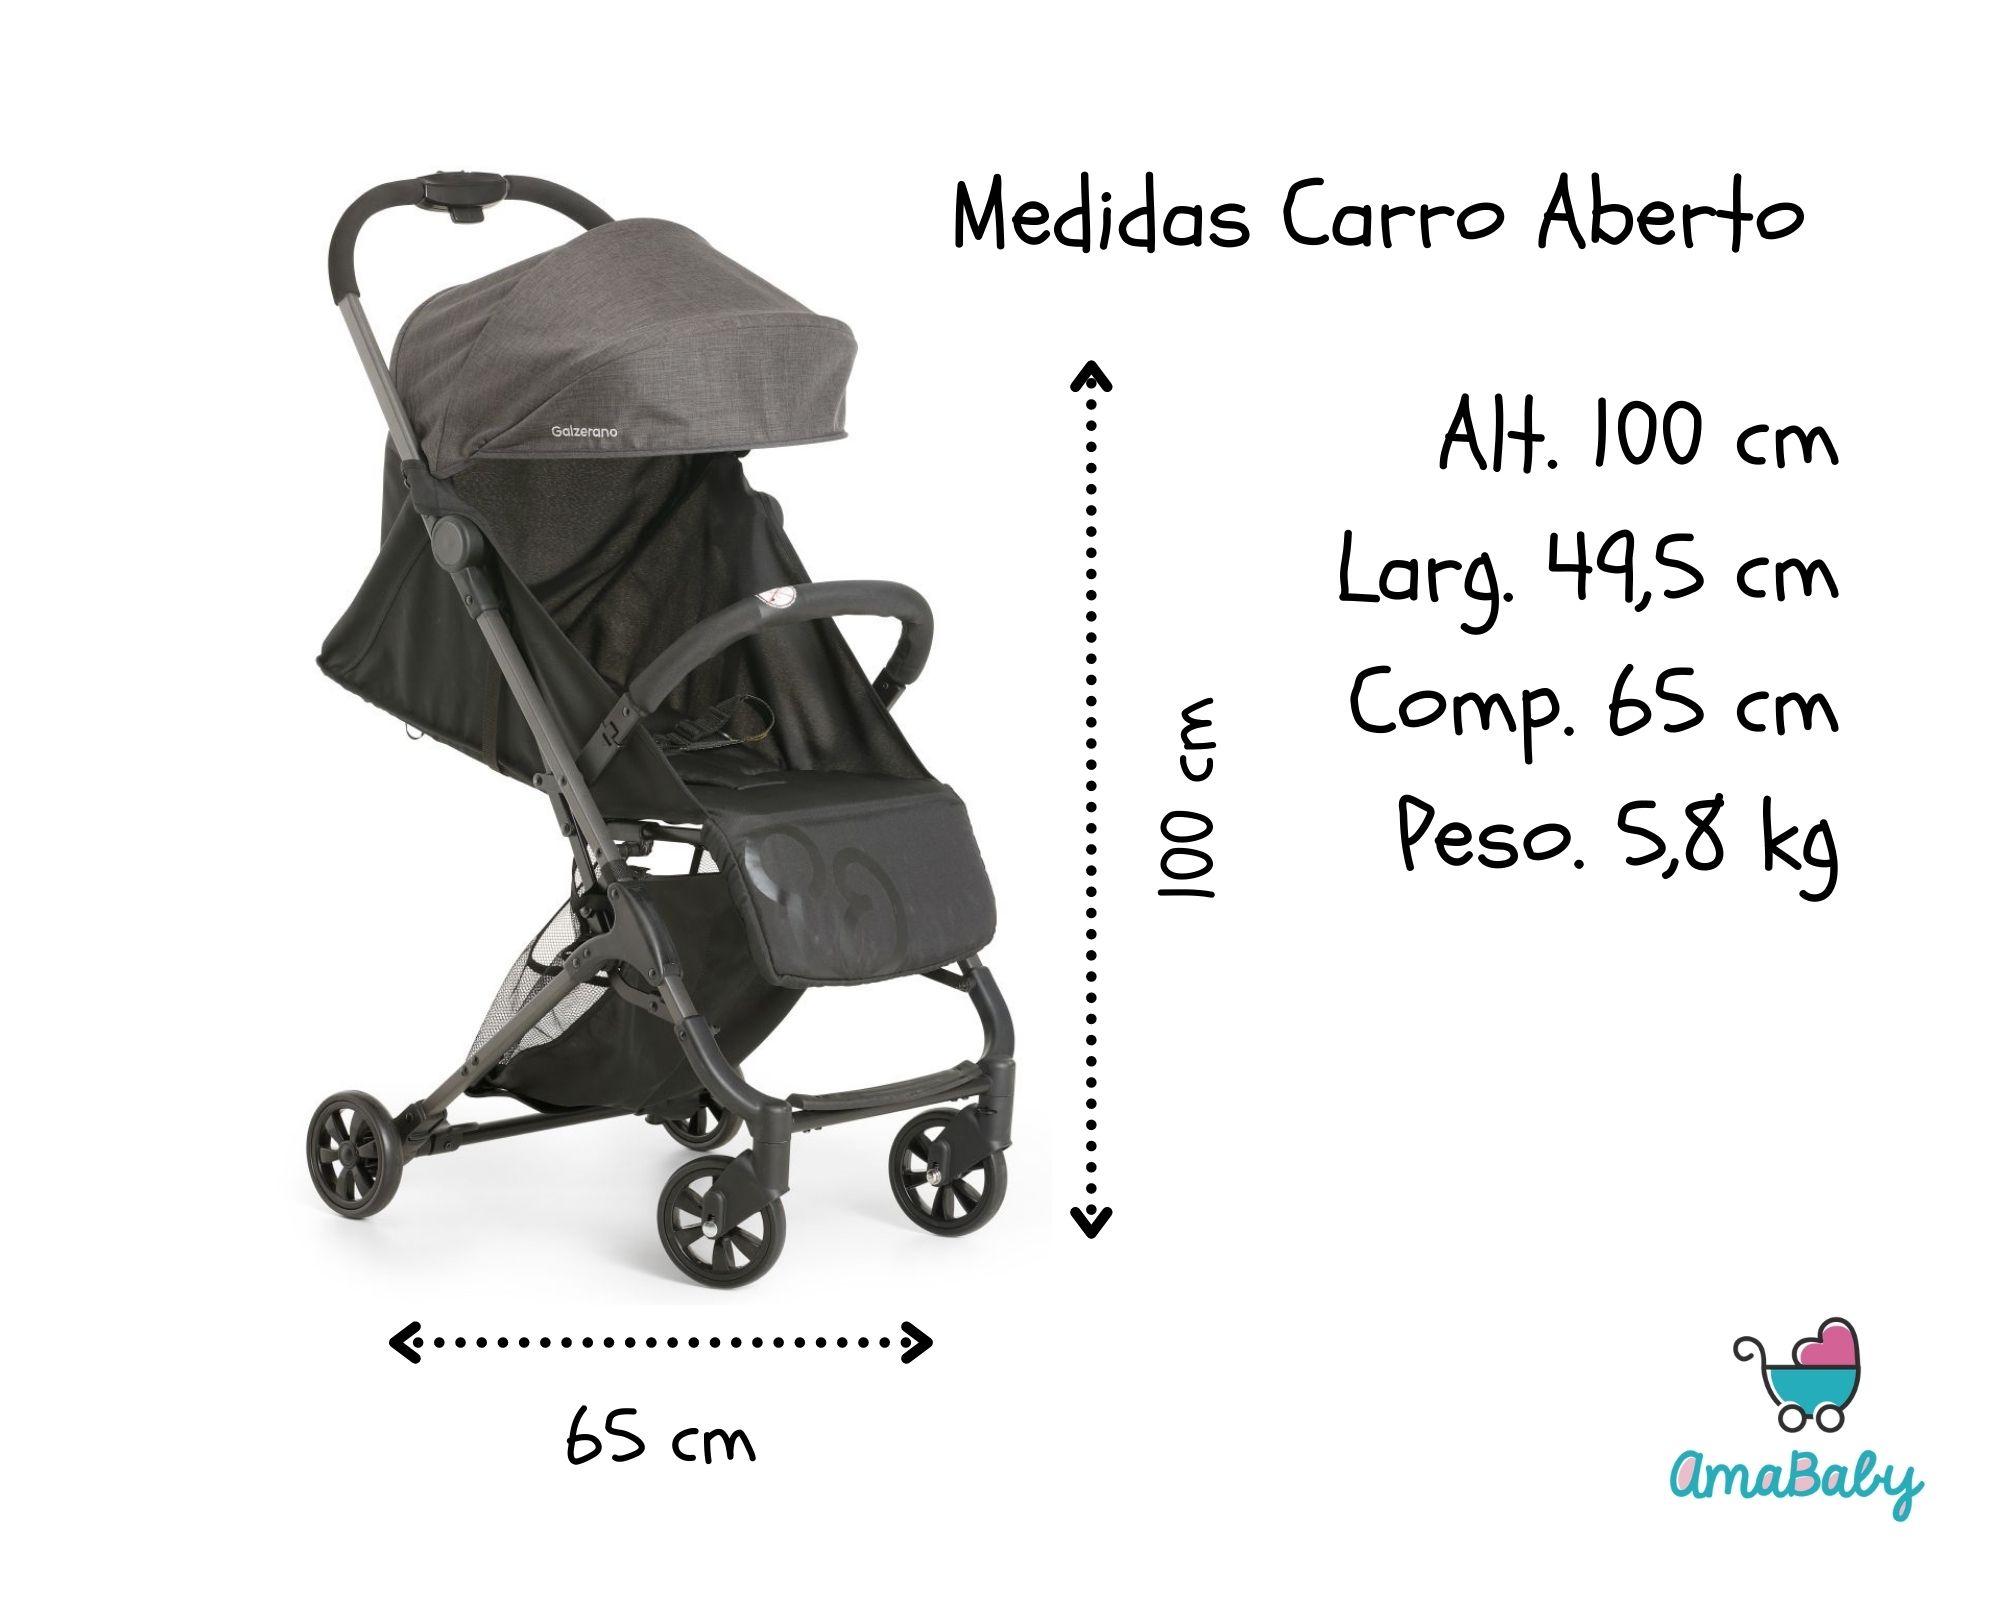 Kit Carrinho Bebê Duolee Gêmeos + Bebe Conforto Galzerano